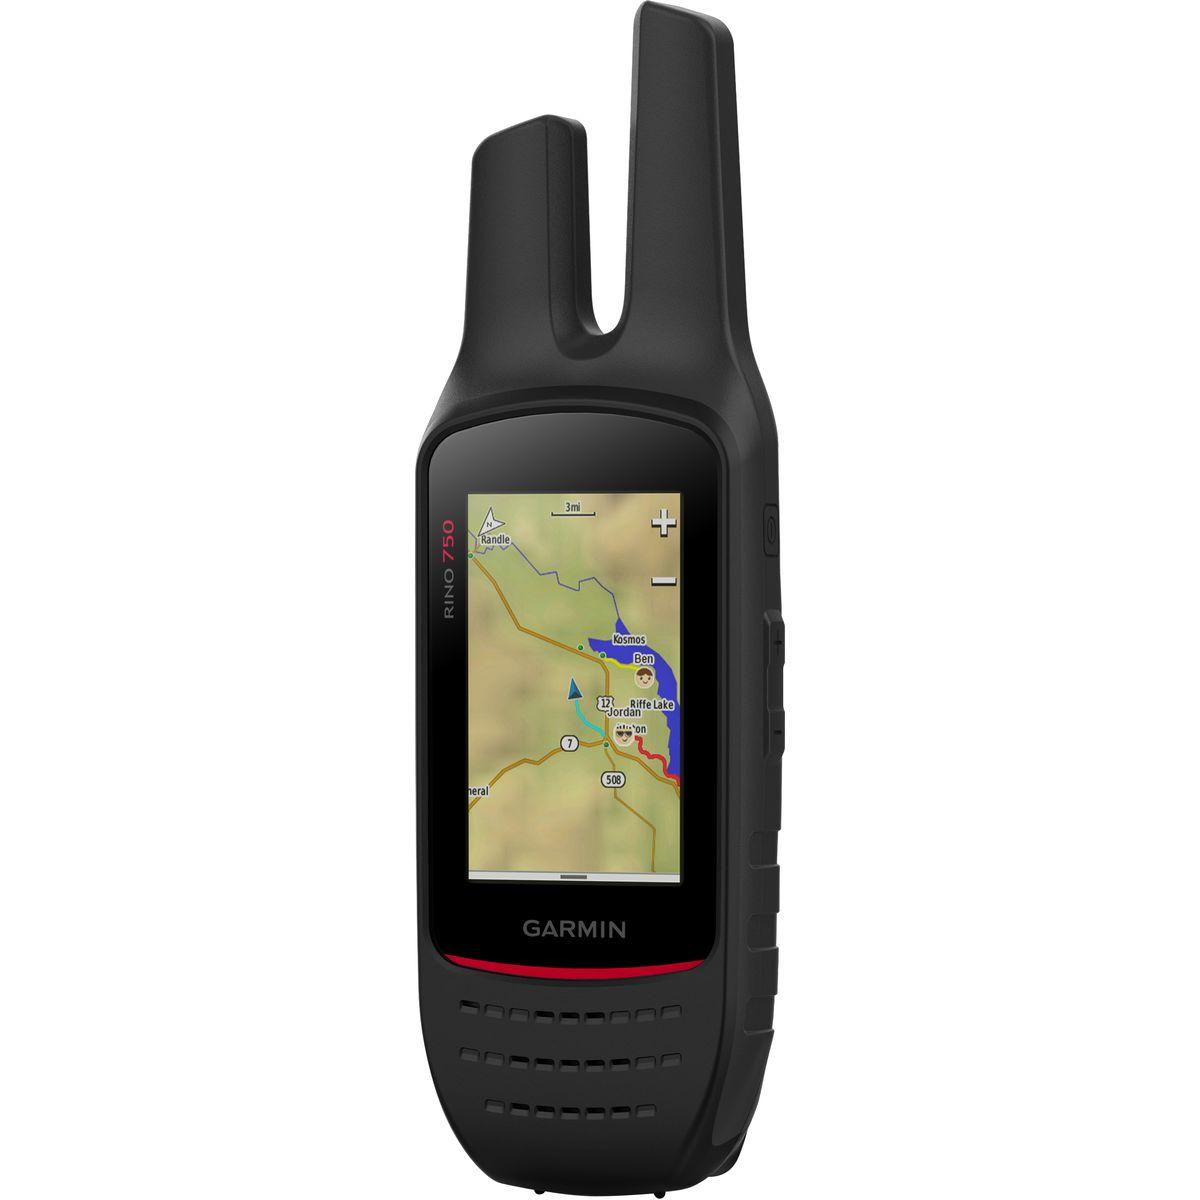 photo: Garmin Rino 750 GPS/2-Way Radio handheld gps receiver